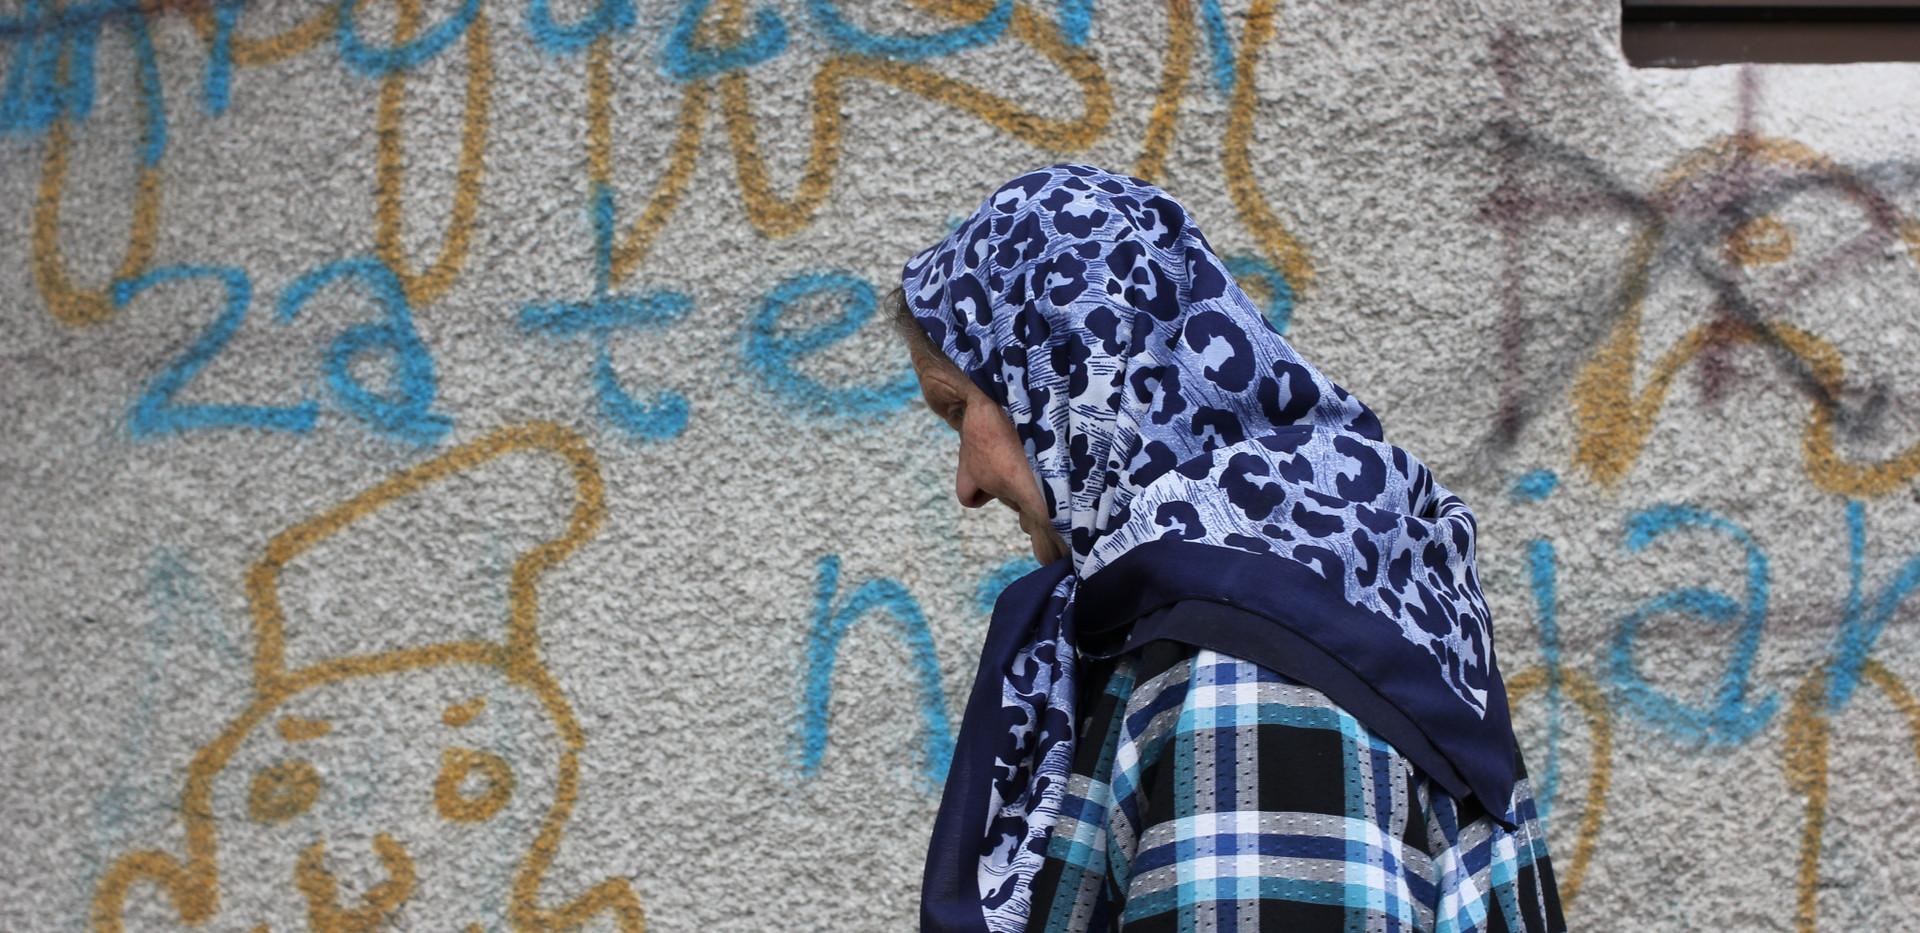 donna bosniaca.jpg